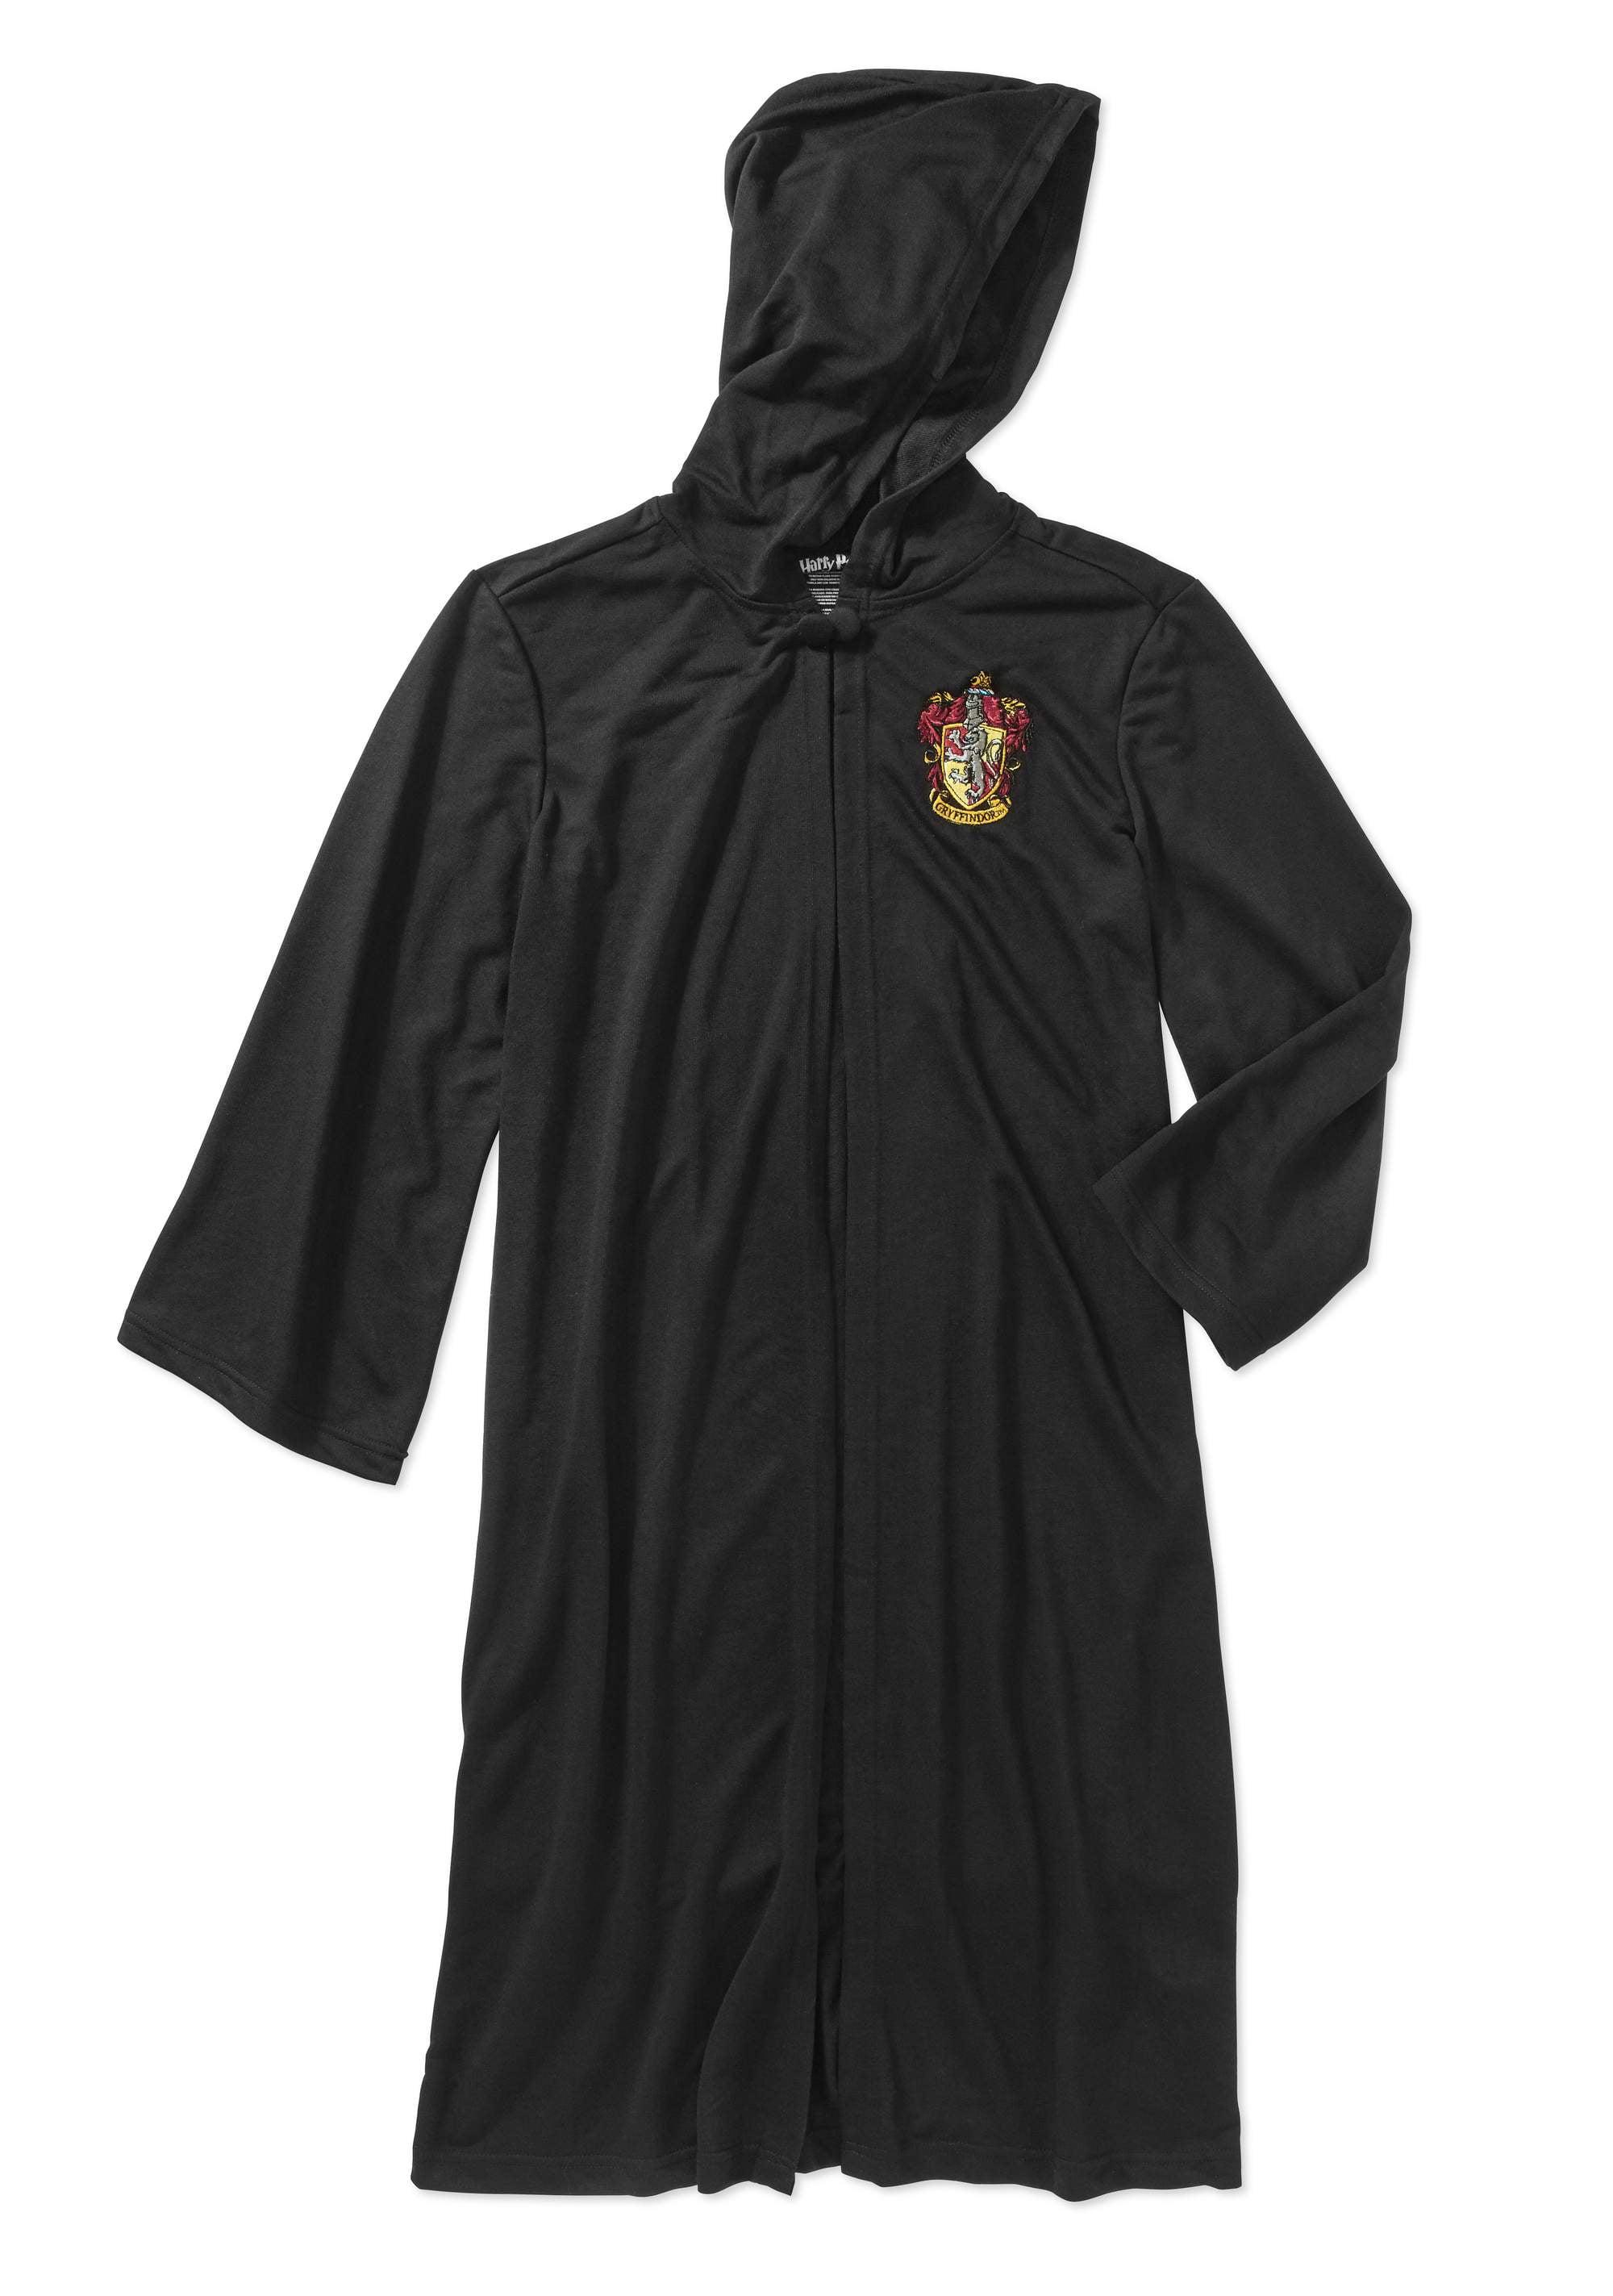 Harry Potter Magician's Cloak Robe (Boys & Girls)